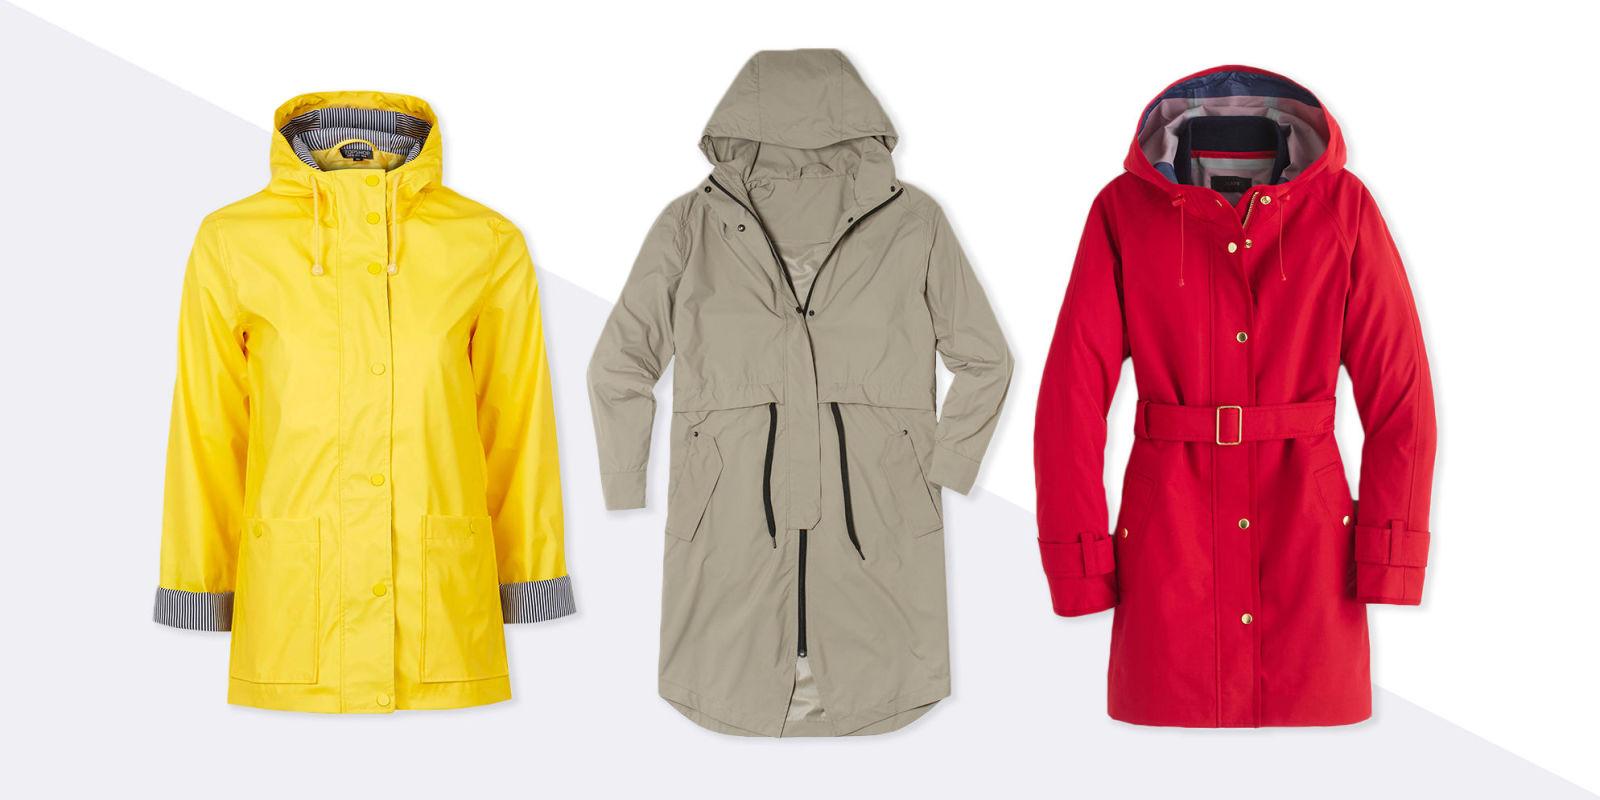 10 Best Rain Coats For Women In 2017 Chic Rain Coats And